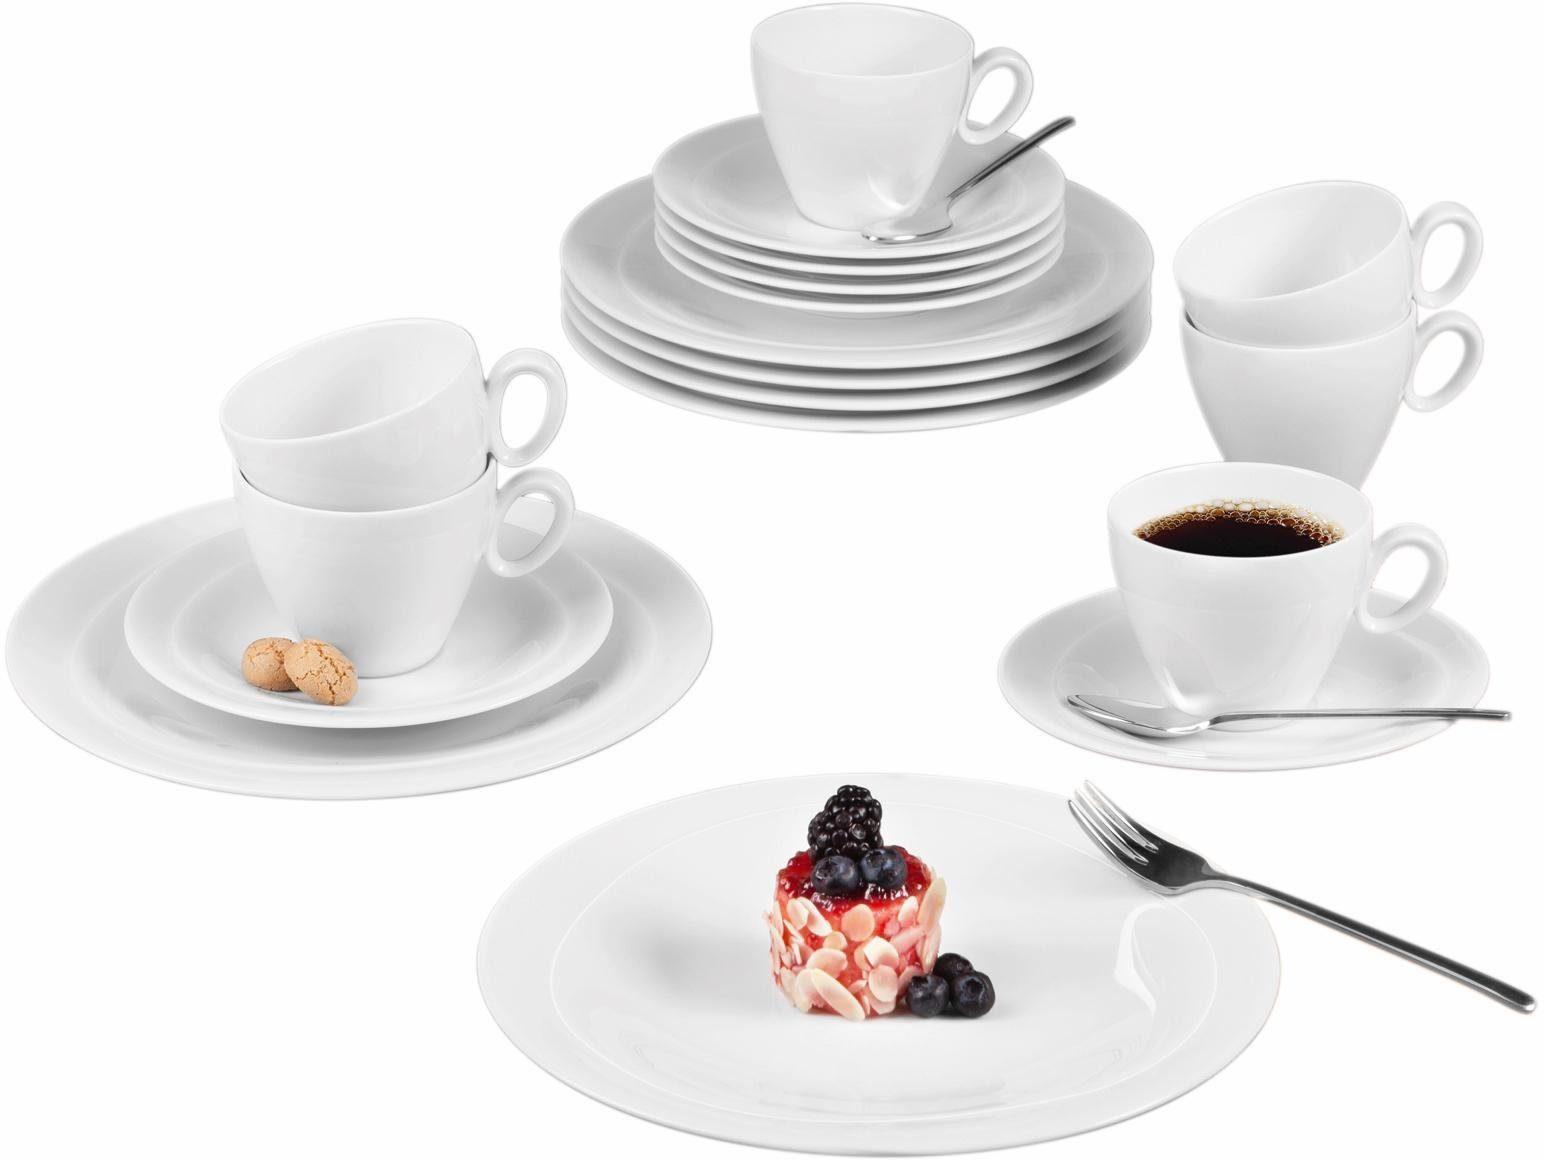 Seltmann Weiden Kaffeeservice »Trio« (18-tlg), Porzellan, Mikrowellengeeignet